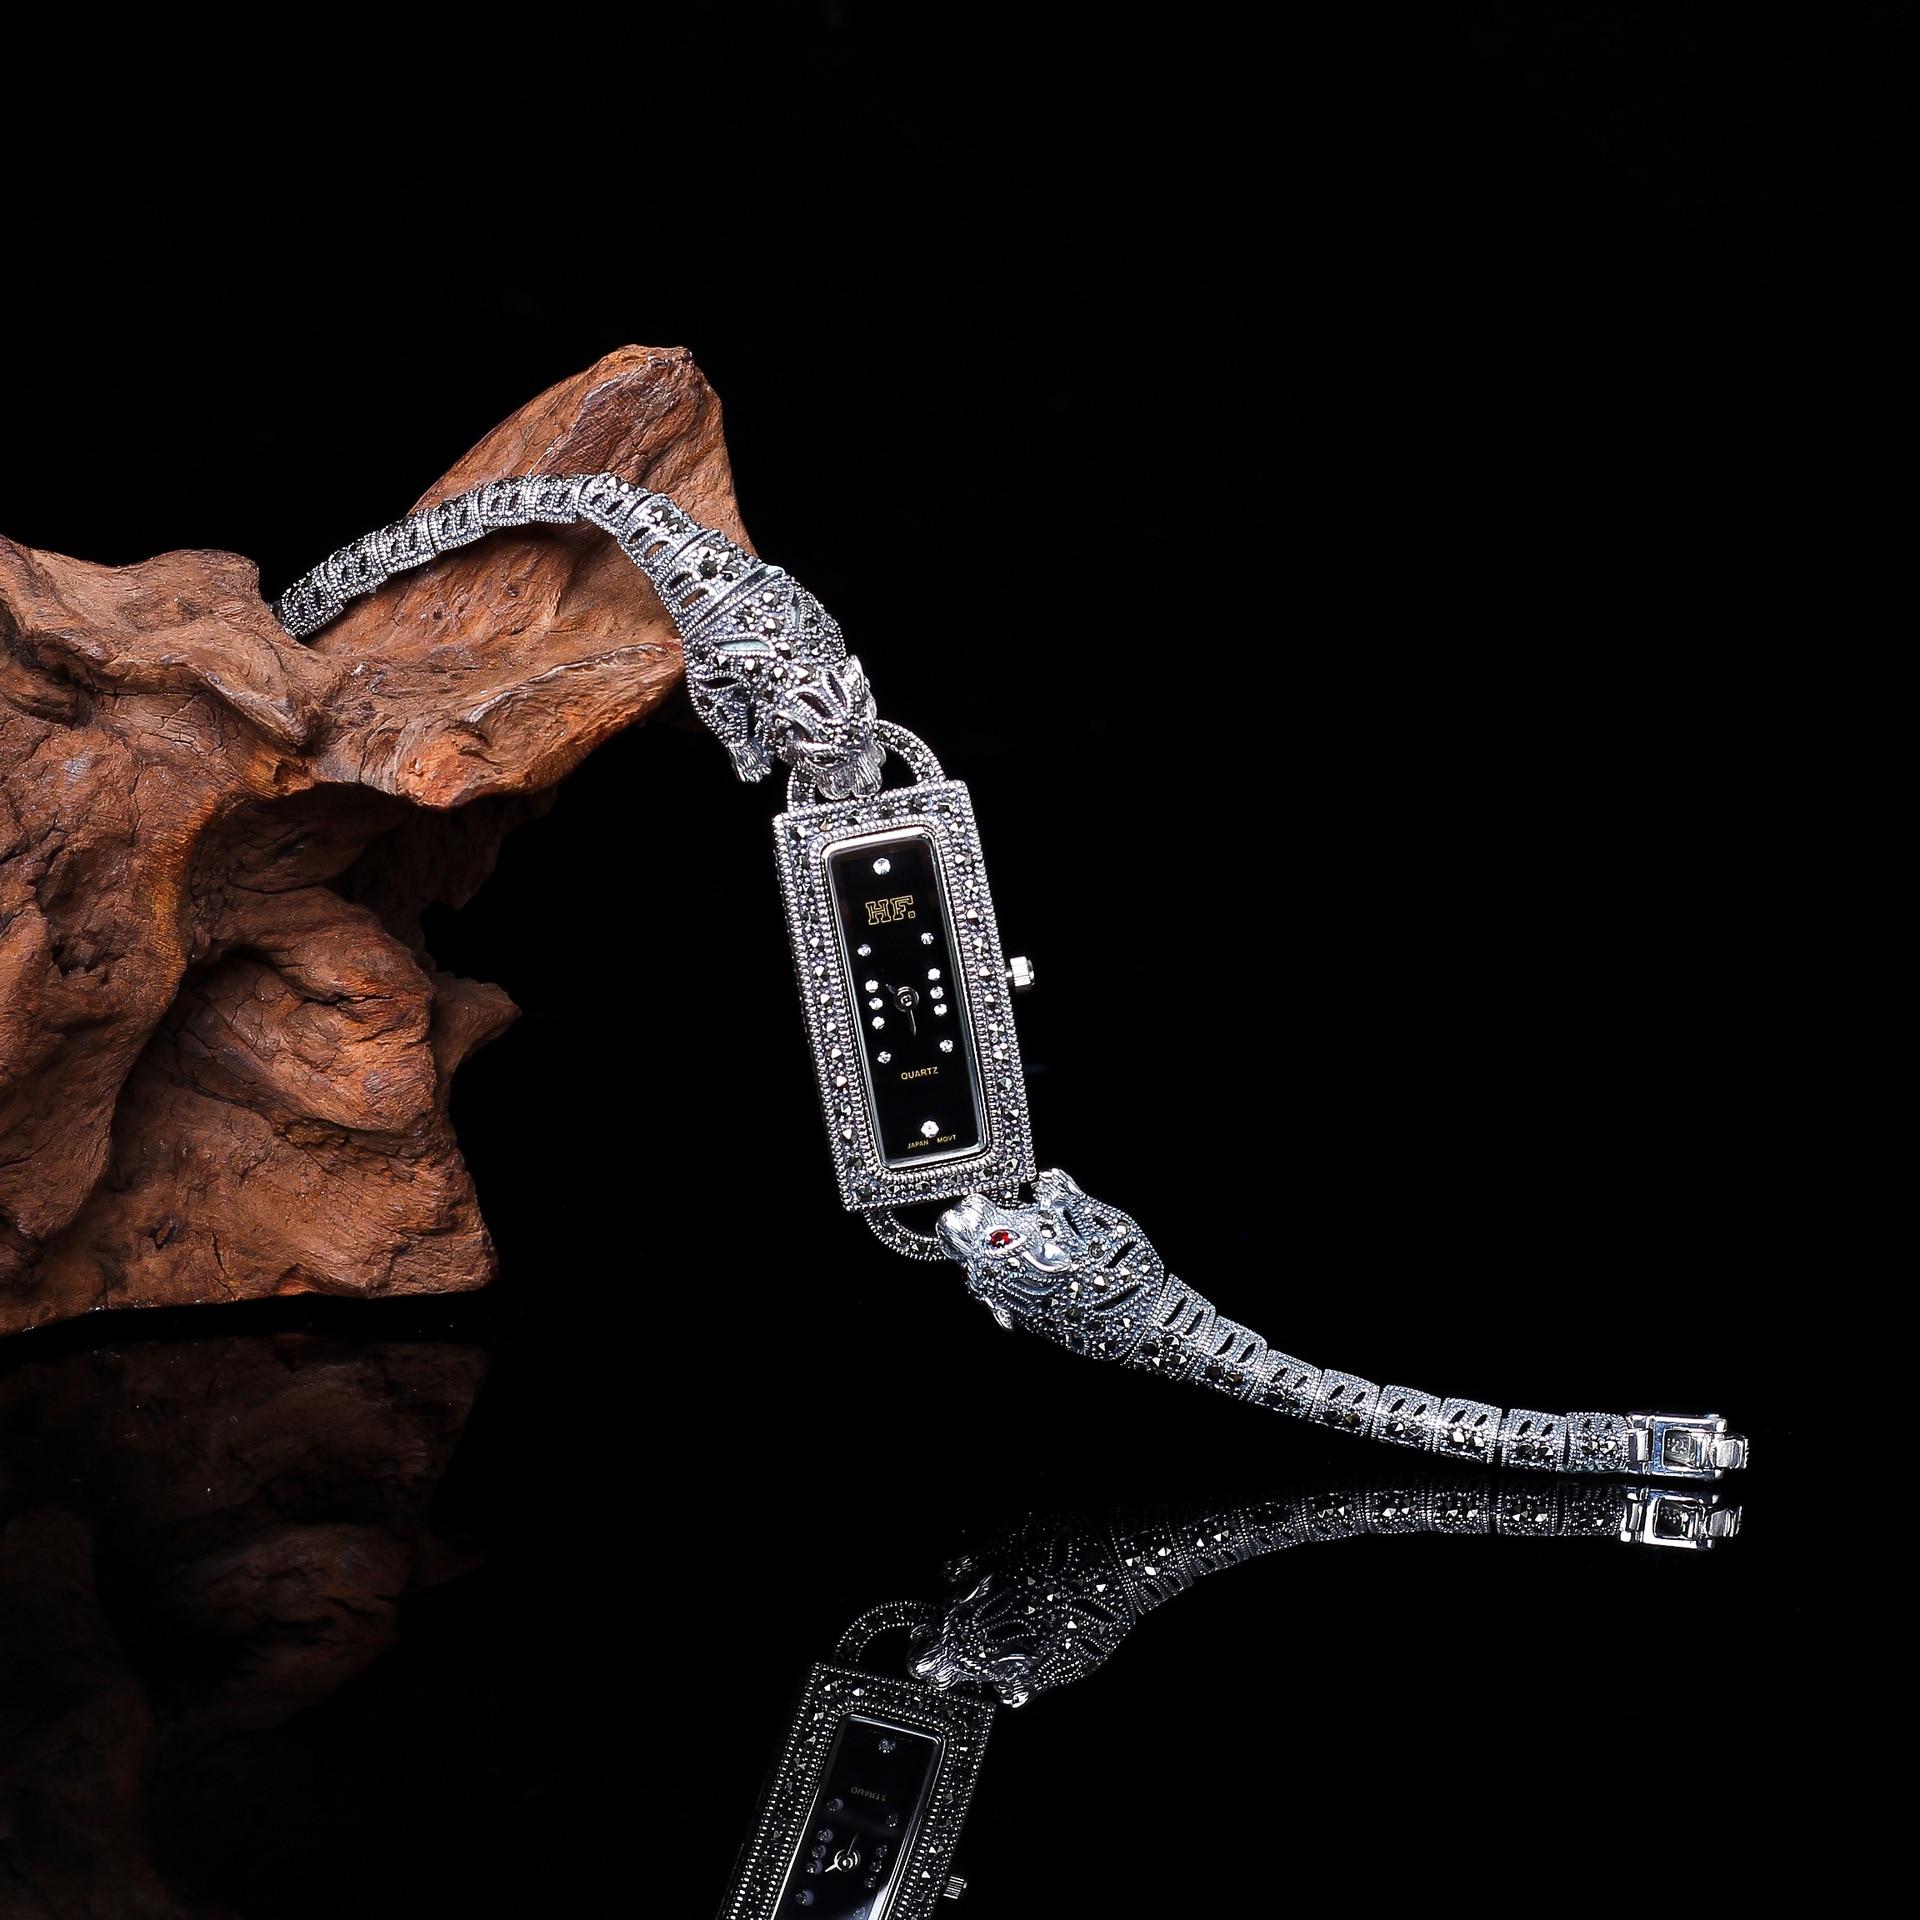 Vintage Thai Silver S925 Sterling Silver Jewelry Thailand Craft Jewelry Silver Ladies Leopard Watch Bracelet